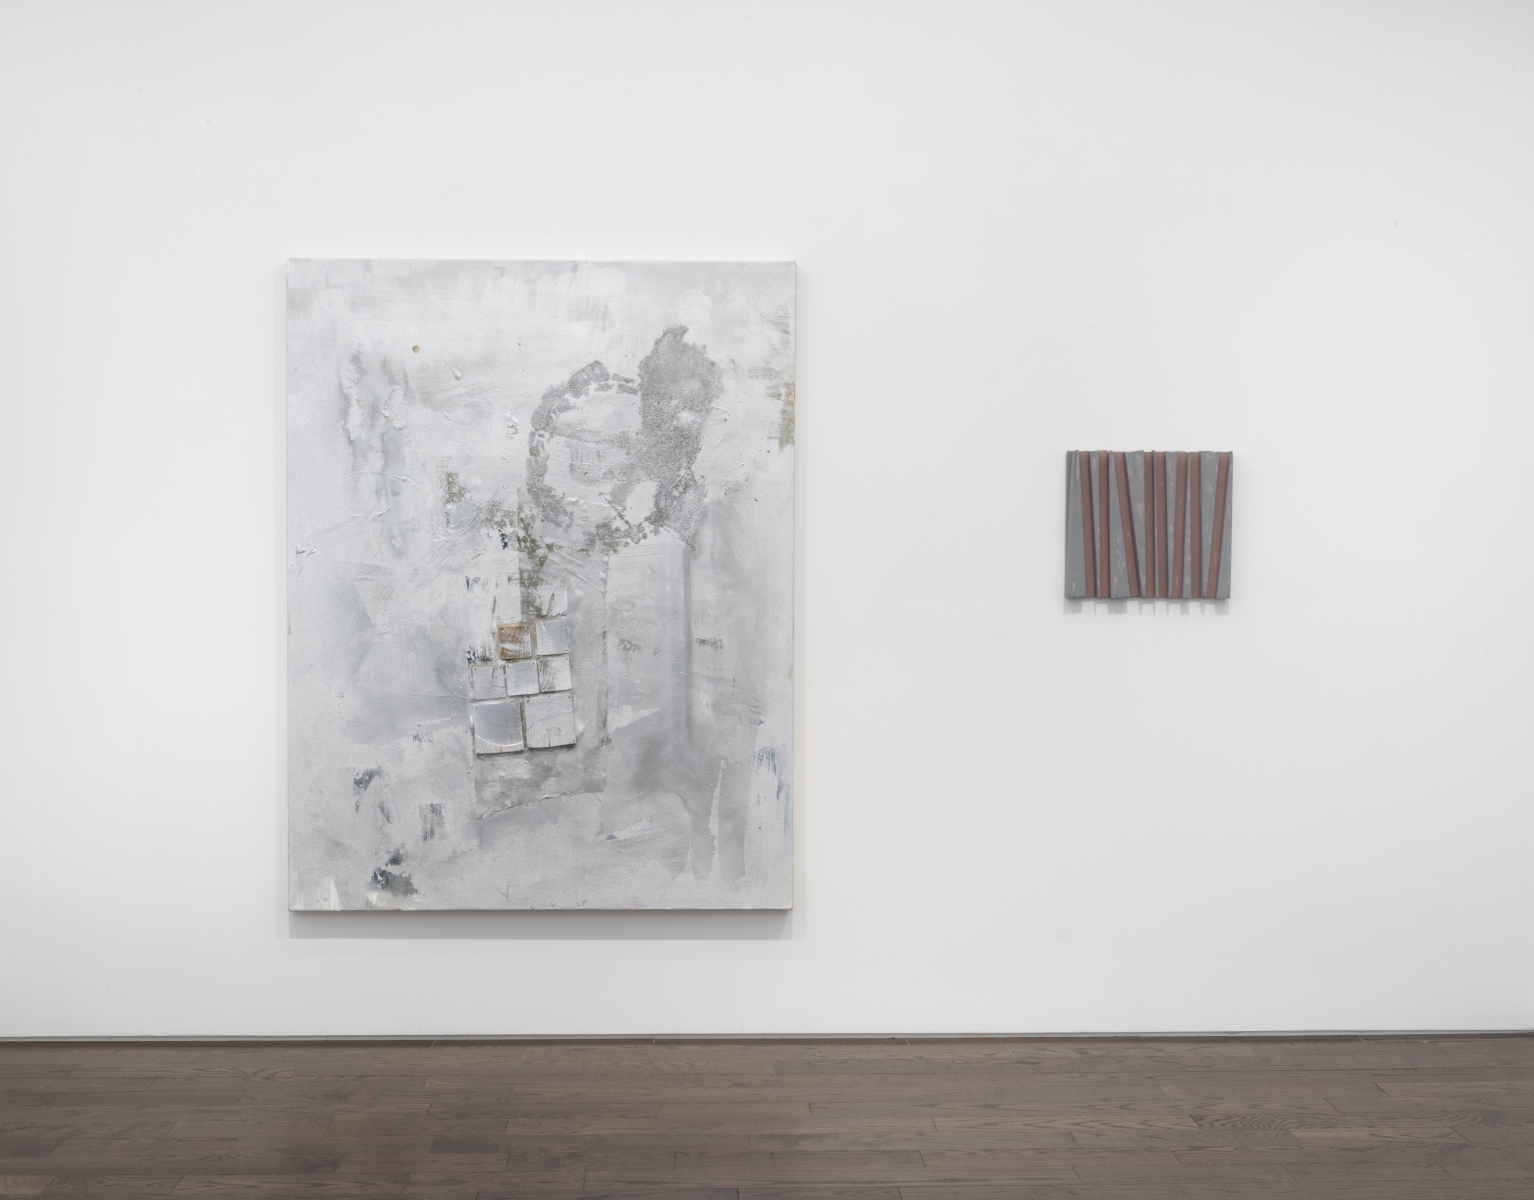 Exhibition View Wrecked Angle Ceysson & Bénétière New York 2021 (6)